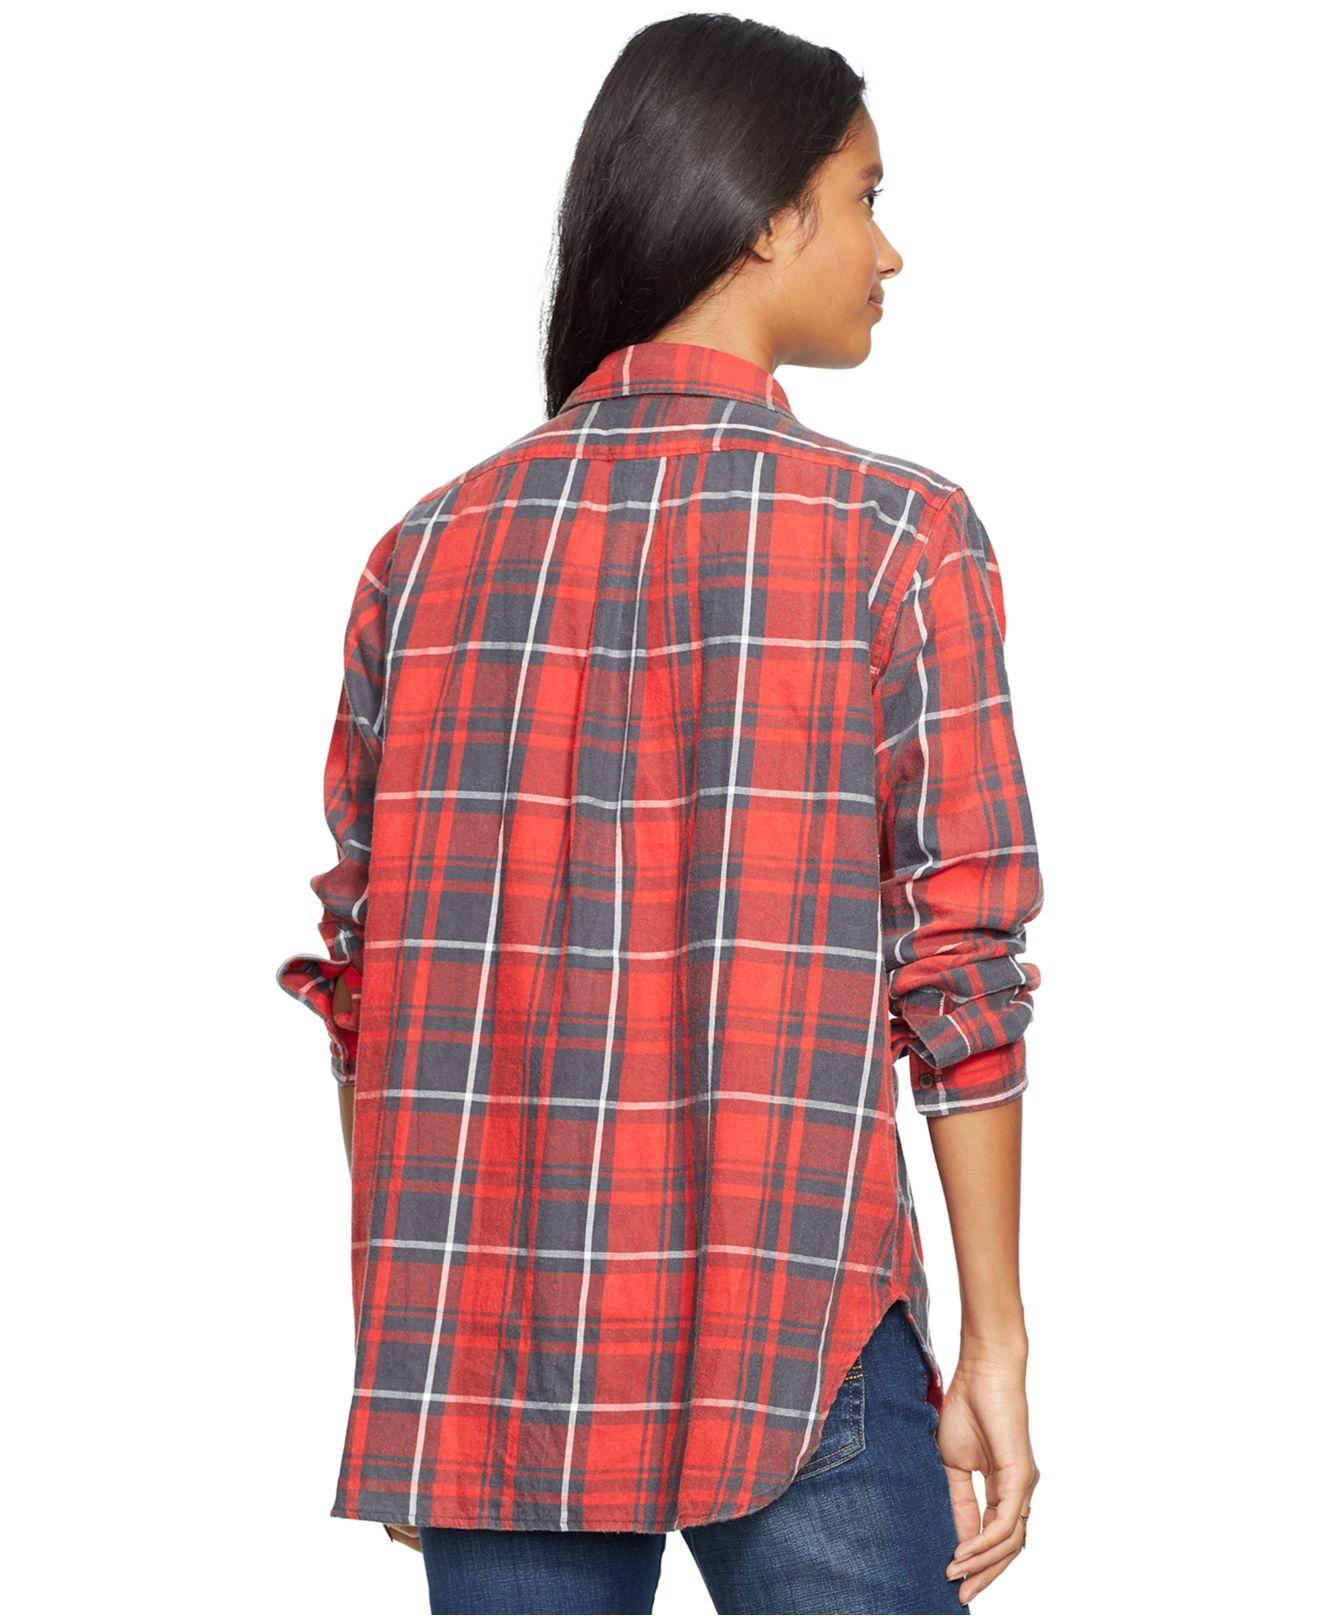 MWL Men's Wrangler® Born Ready Long Sleeve Western Snap Two Pocket Flap Check Plaid Shirt. $ MLD10 Men's Wrangler® Western Snap Denim Shirt. $ MWL Men's Wrangler® Long Sleeve Western Snap with Slanted W Pockets Dark Denim Shirt. $ MWL Men's Wrangler® Born Ready Long Sleeve Button Down Two Pocket Denim Shirt.